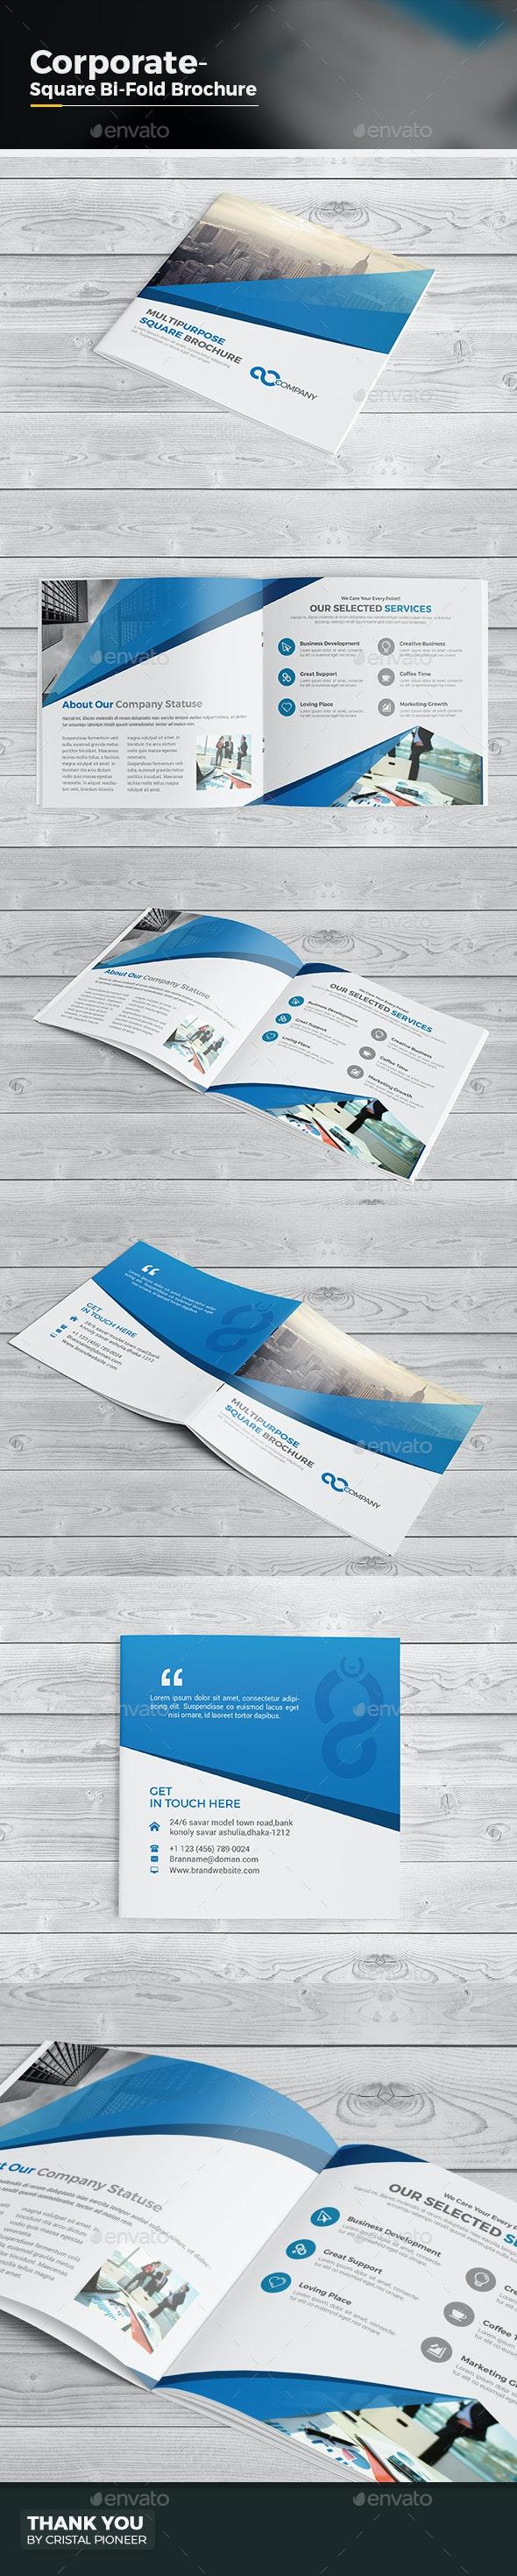 Square Bi Fold Brochure- Multipurpose - Corporate Brochures